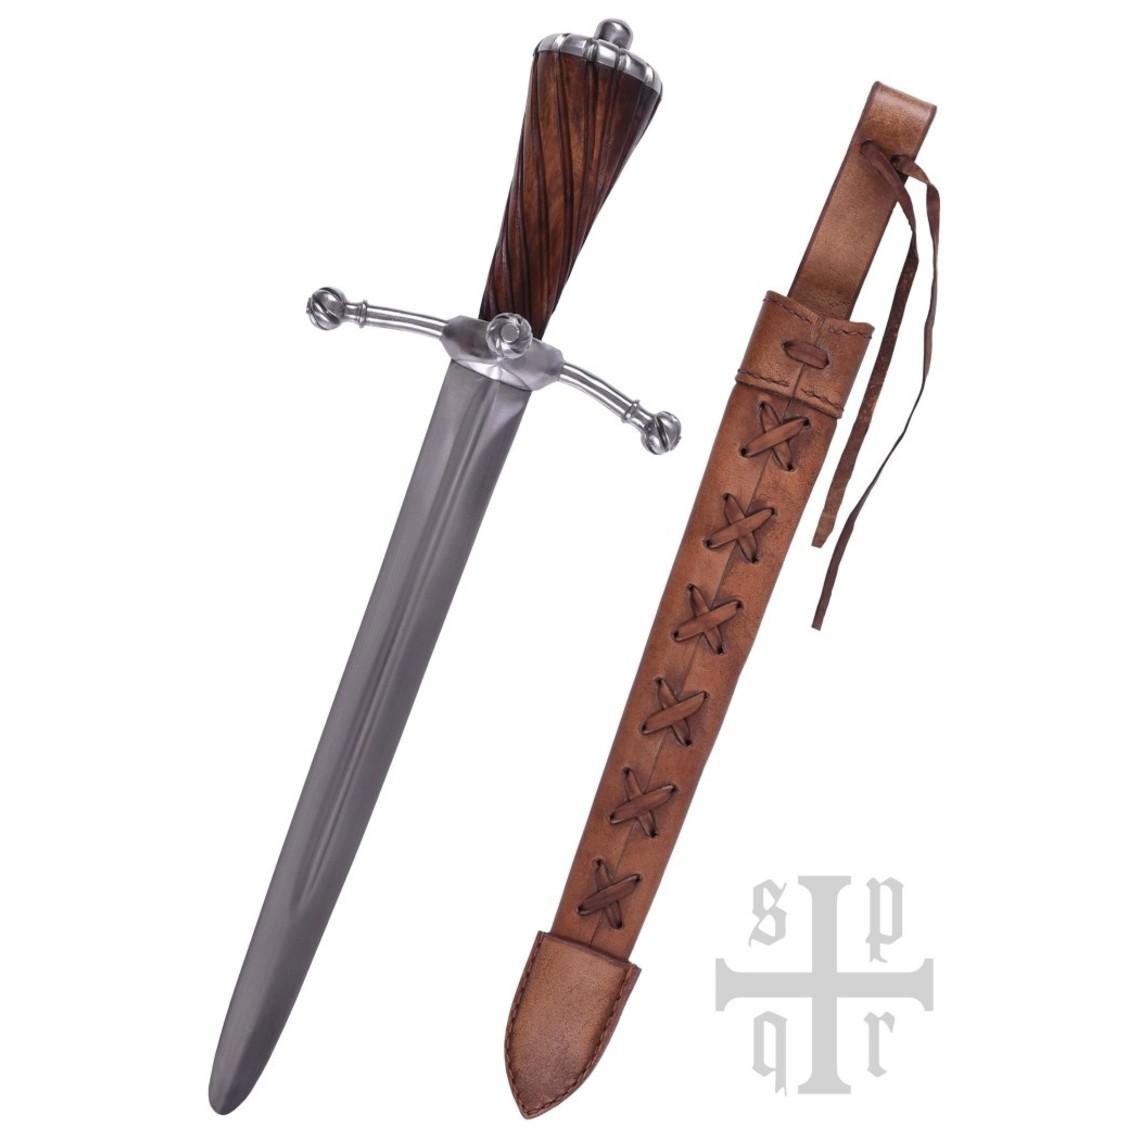 SPQR Laatmiddeleeuwse dolk Landsknecht, battle-ready